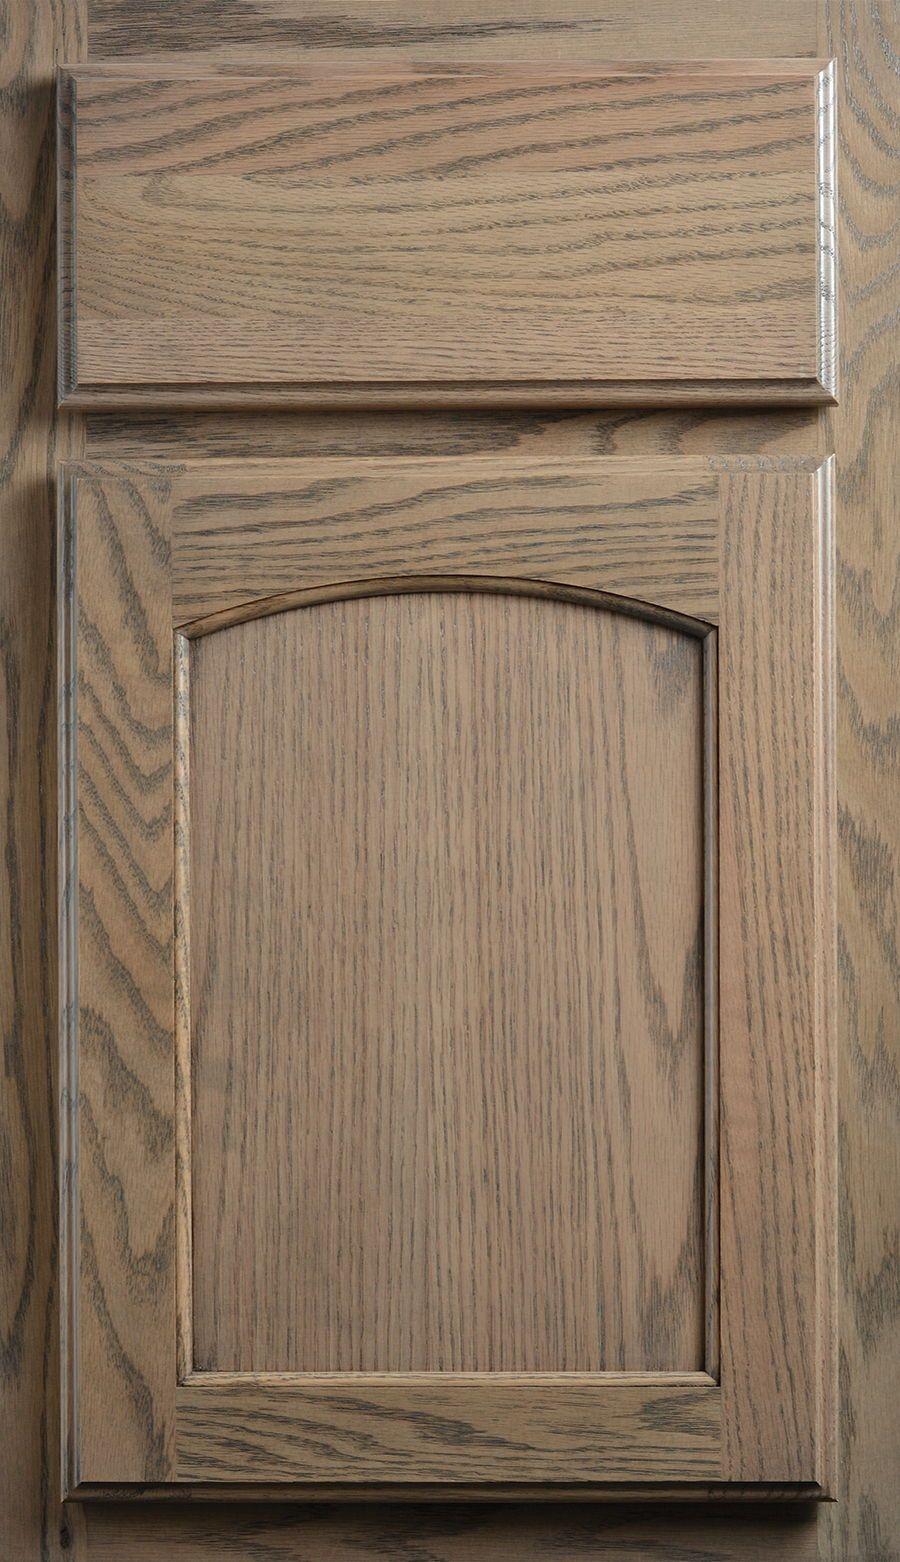 Dura Supreme Cabinetry Door Style Manchester Panel Standard Overlay Cabinet Door Style Shown In The Ha Cabinet Door Styles Kitchen Cabinet Styles Red Oak Wood